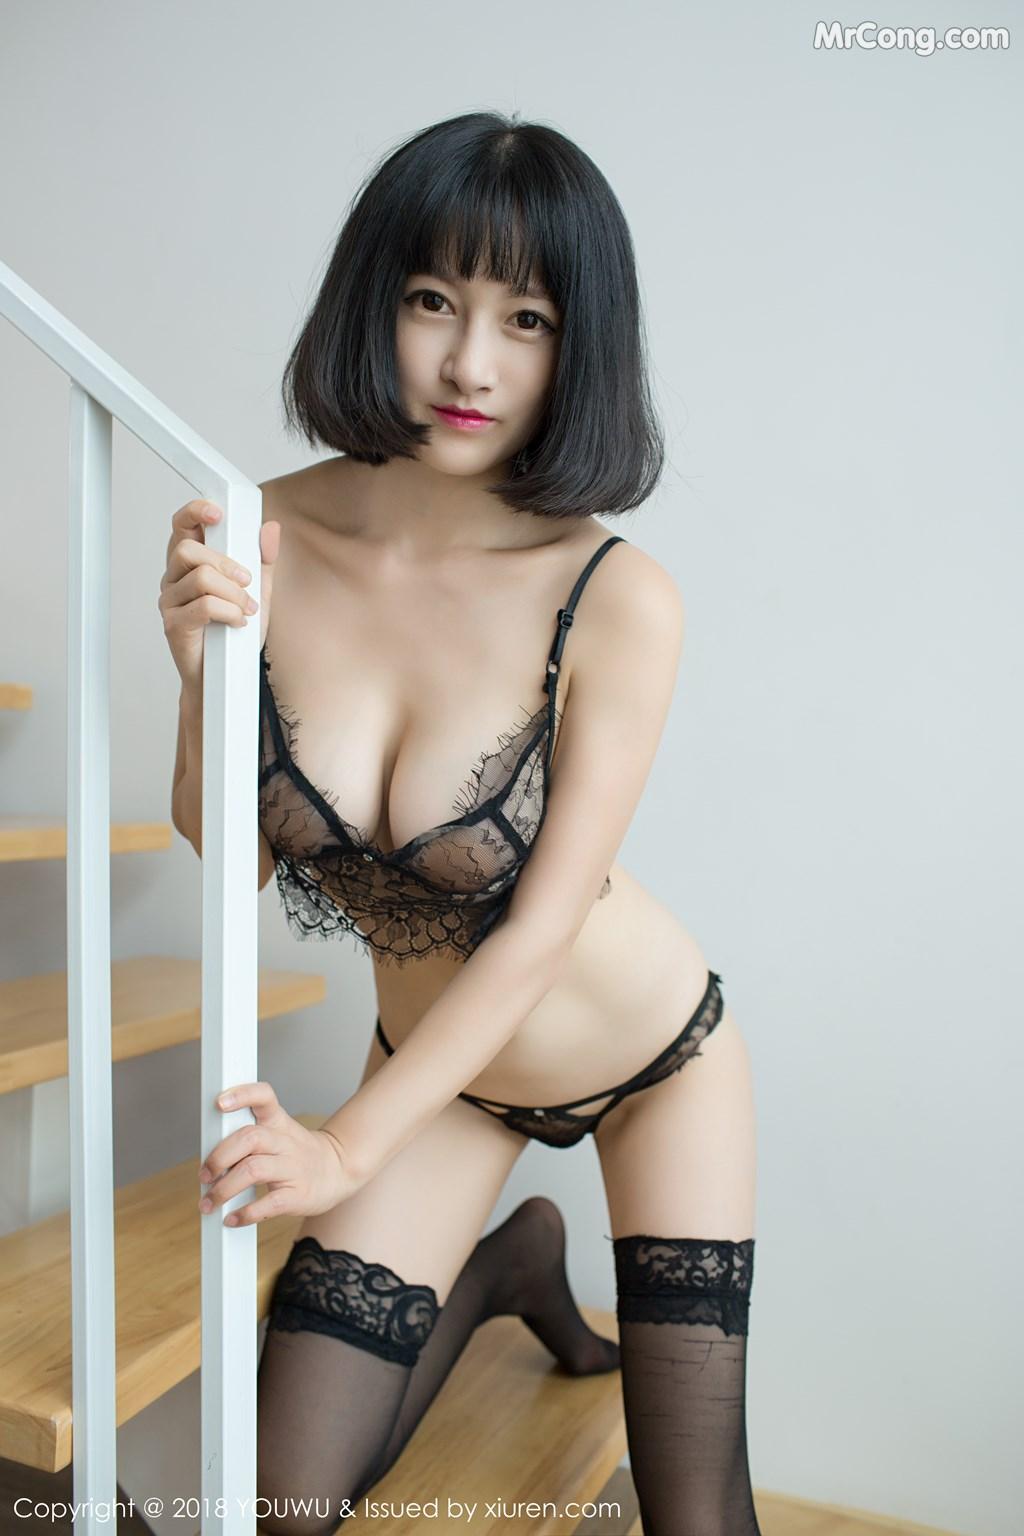 Image YouWu-Vol.114-MrCong.com-006 in post YouWu Vol.114: Người mẫu Xiao Tan Ge (小探戈-) (45 ảnh)